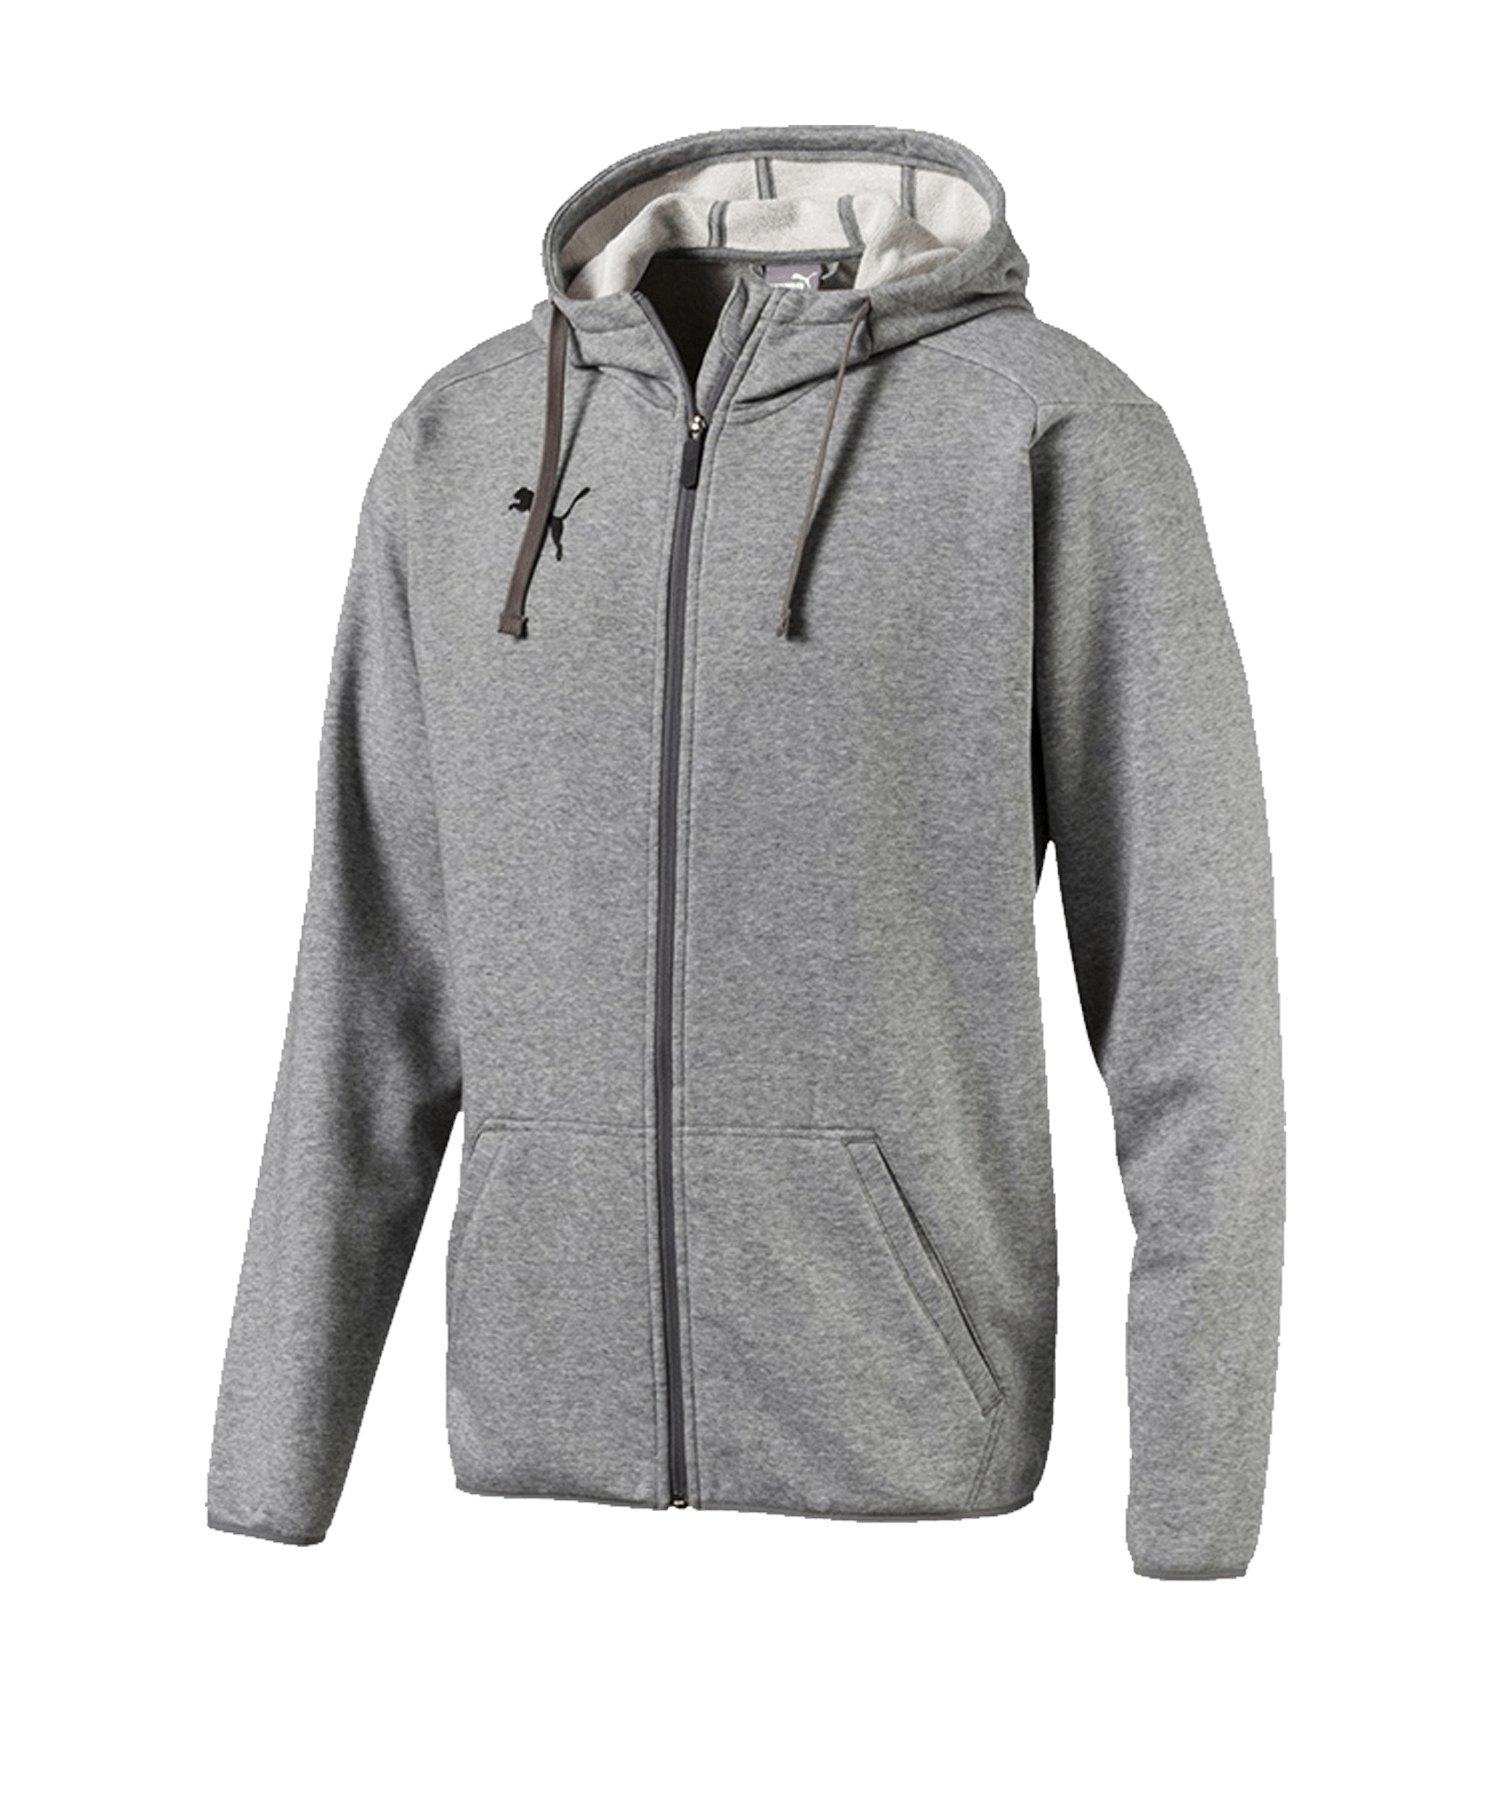 PUMA LIGA Casual Jacket Jacke Grau F33 - grau